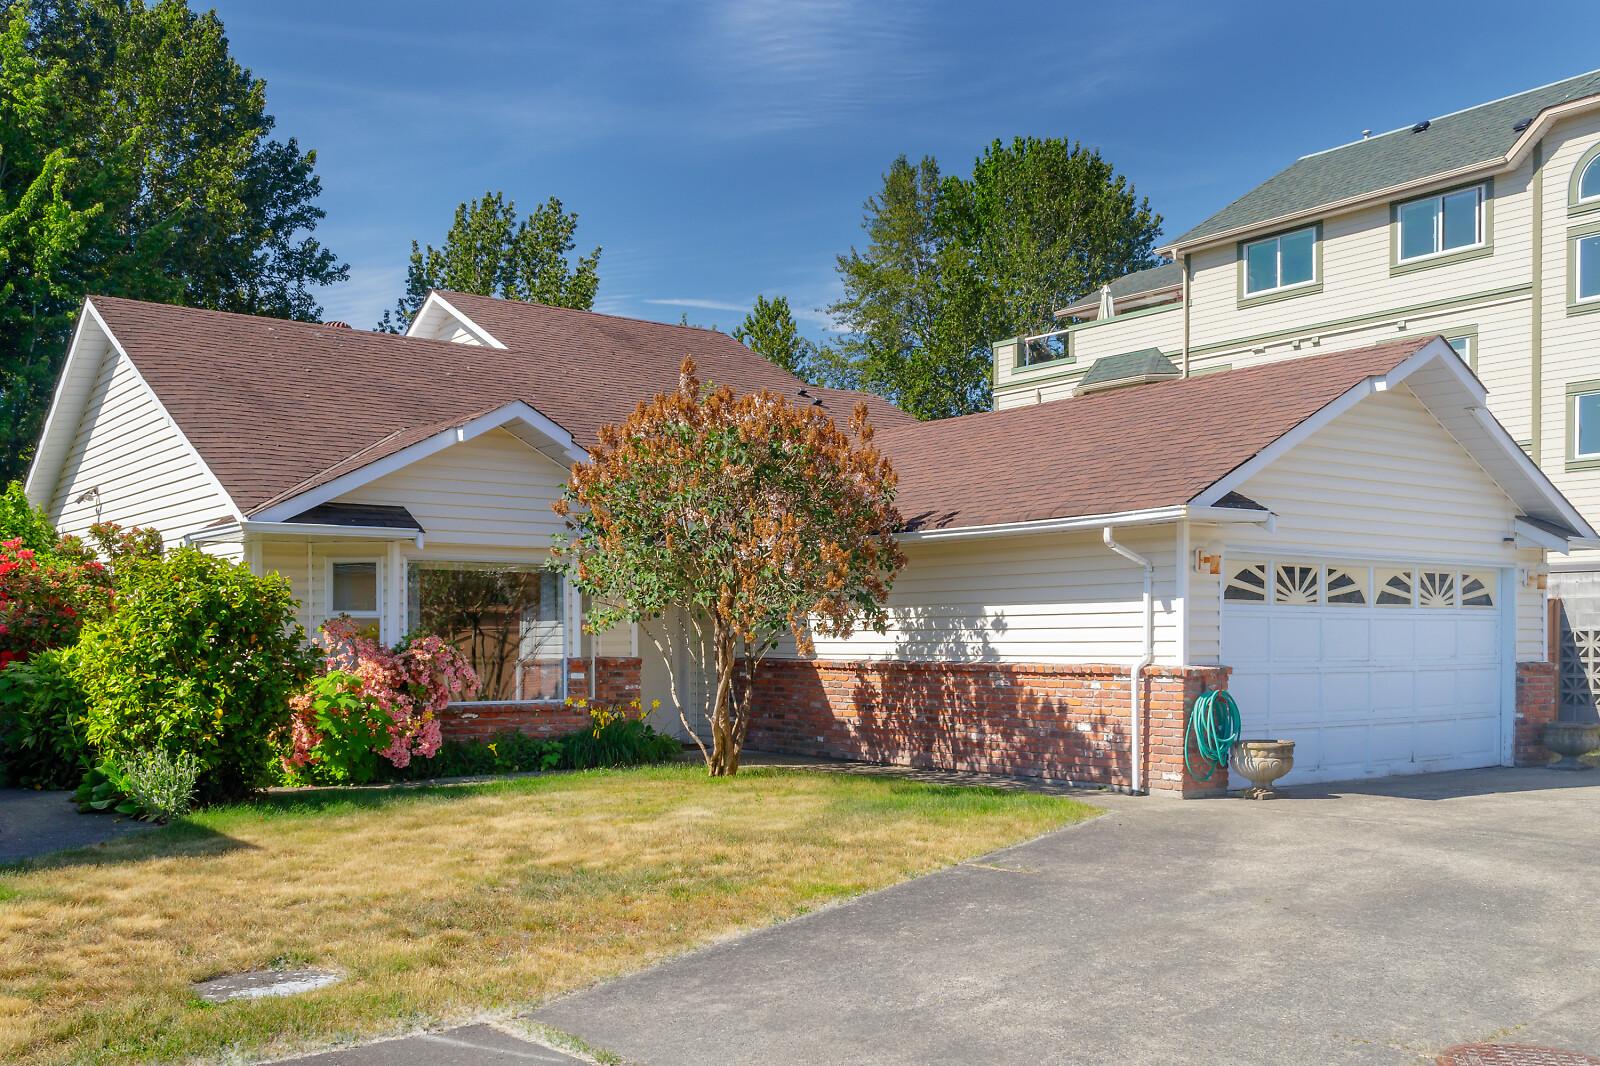 24 111 McKinstry Rd, duncan, British Columbia